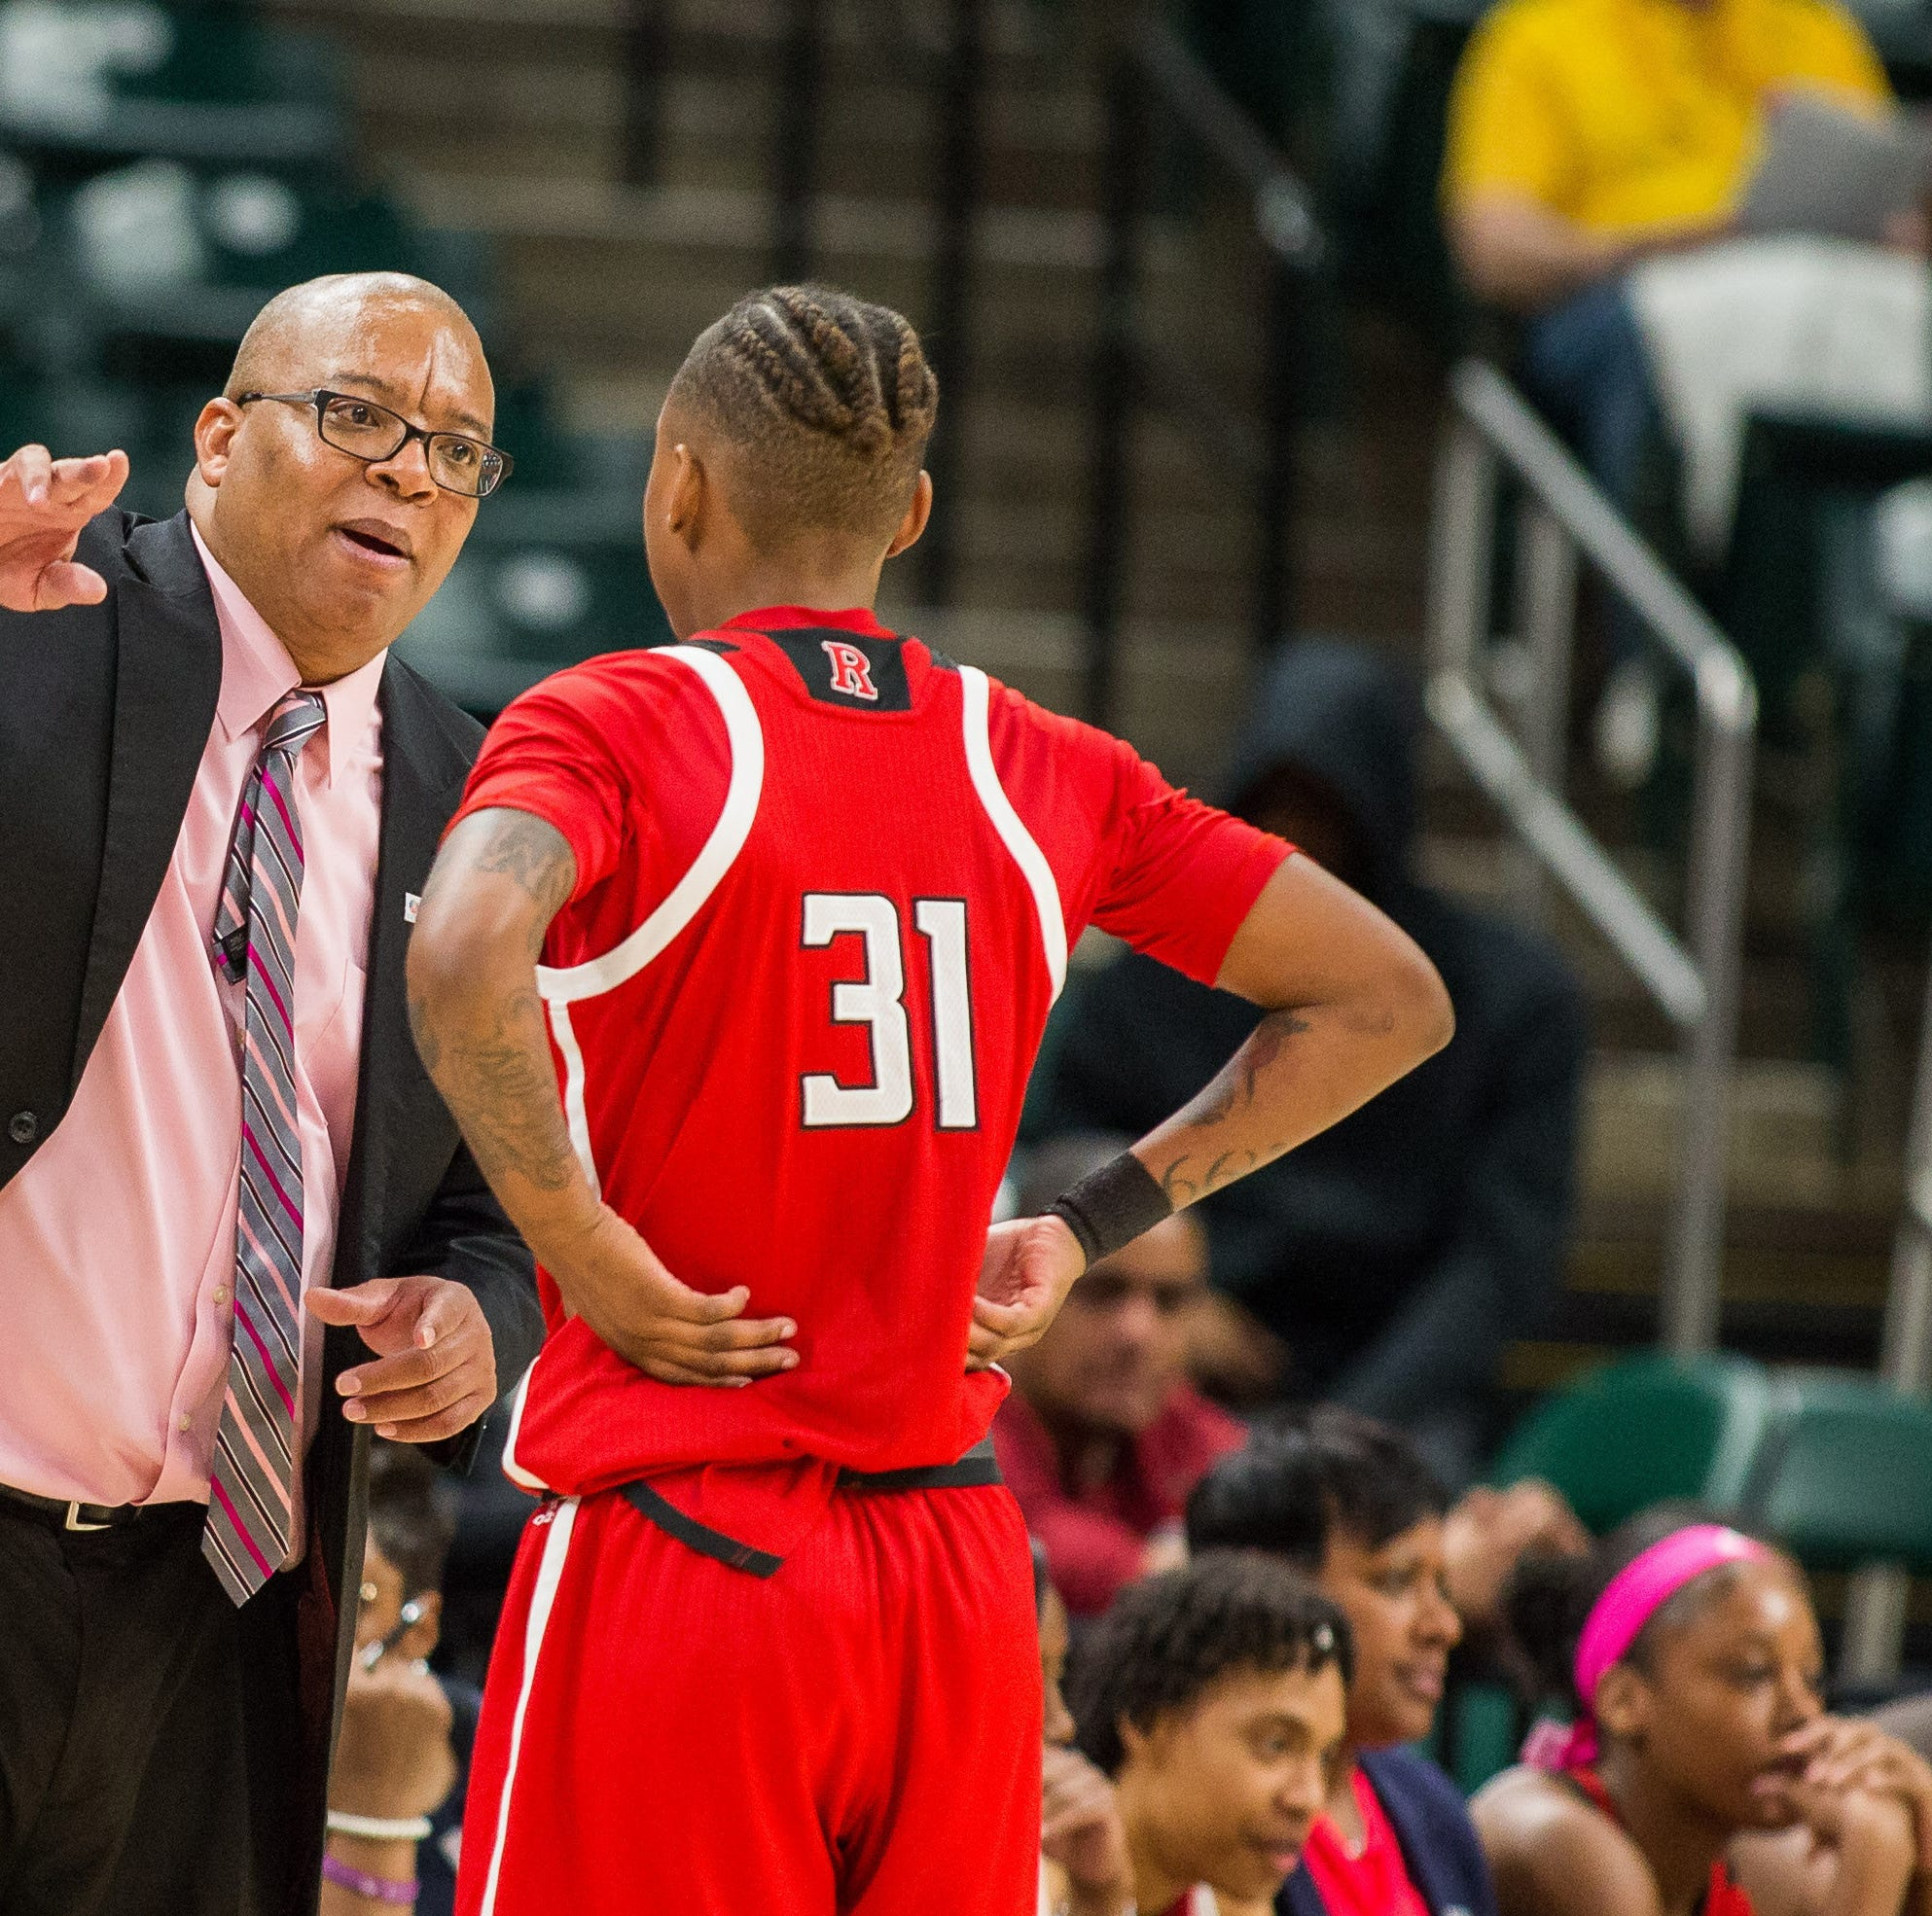 NCAA Women's Tournament 2019: Rutgers a 7-seed, faces No. 10 Buffalo; UConn reunion next?